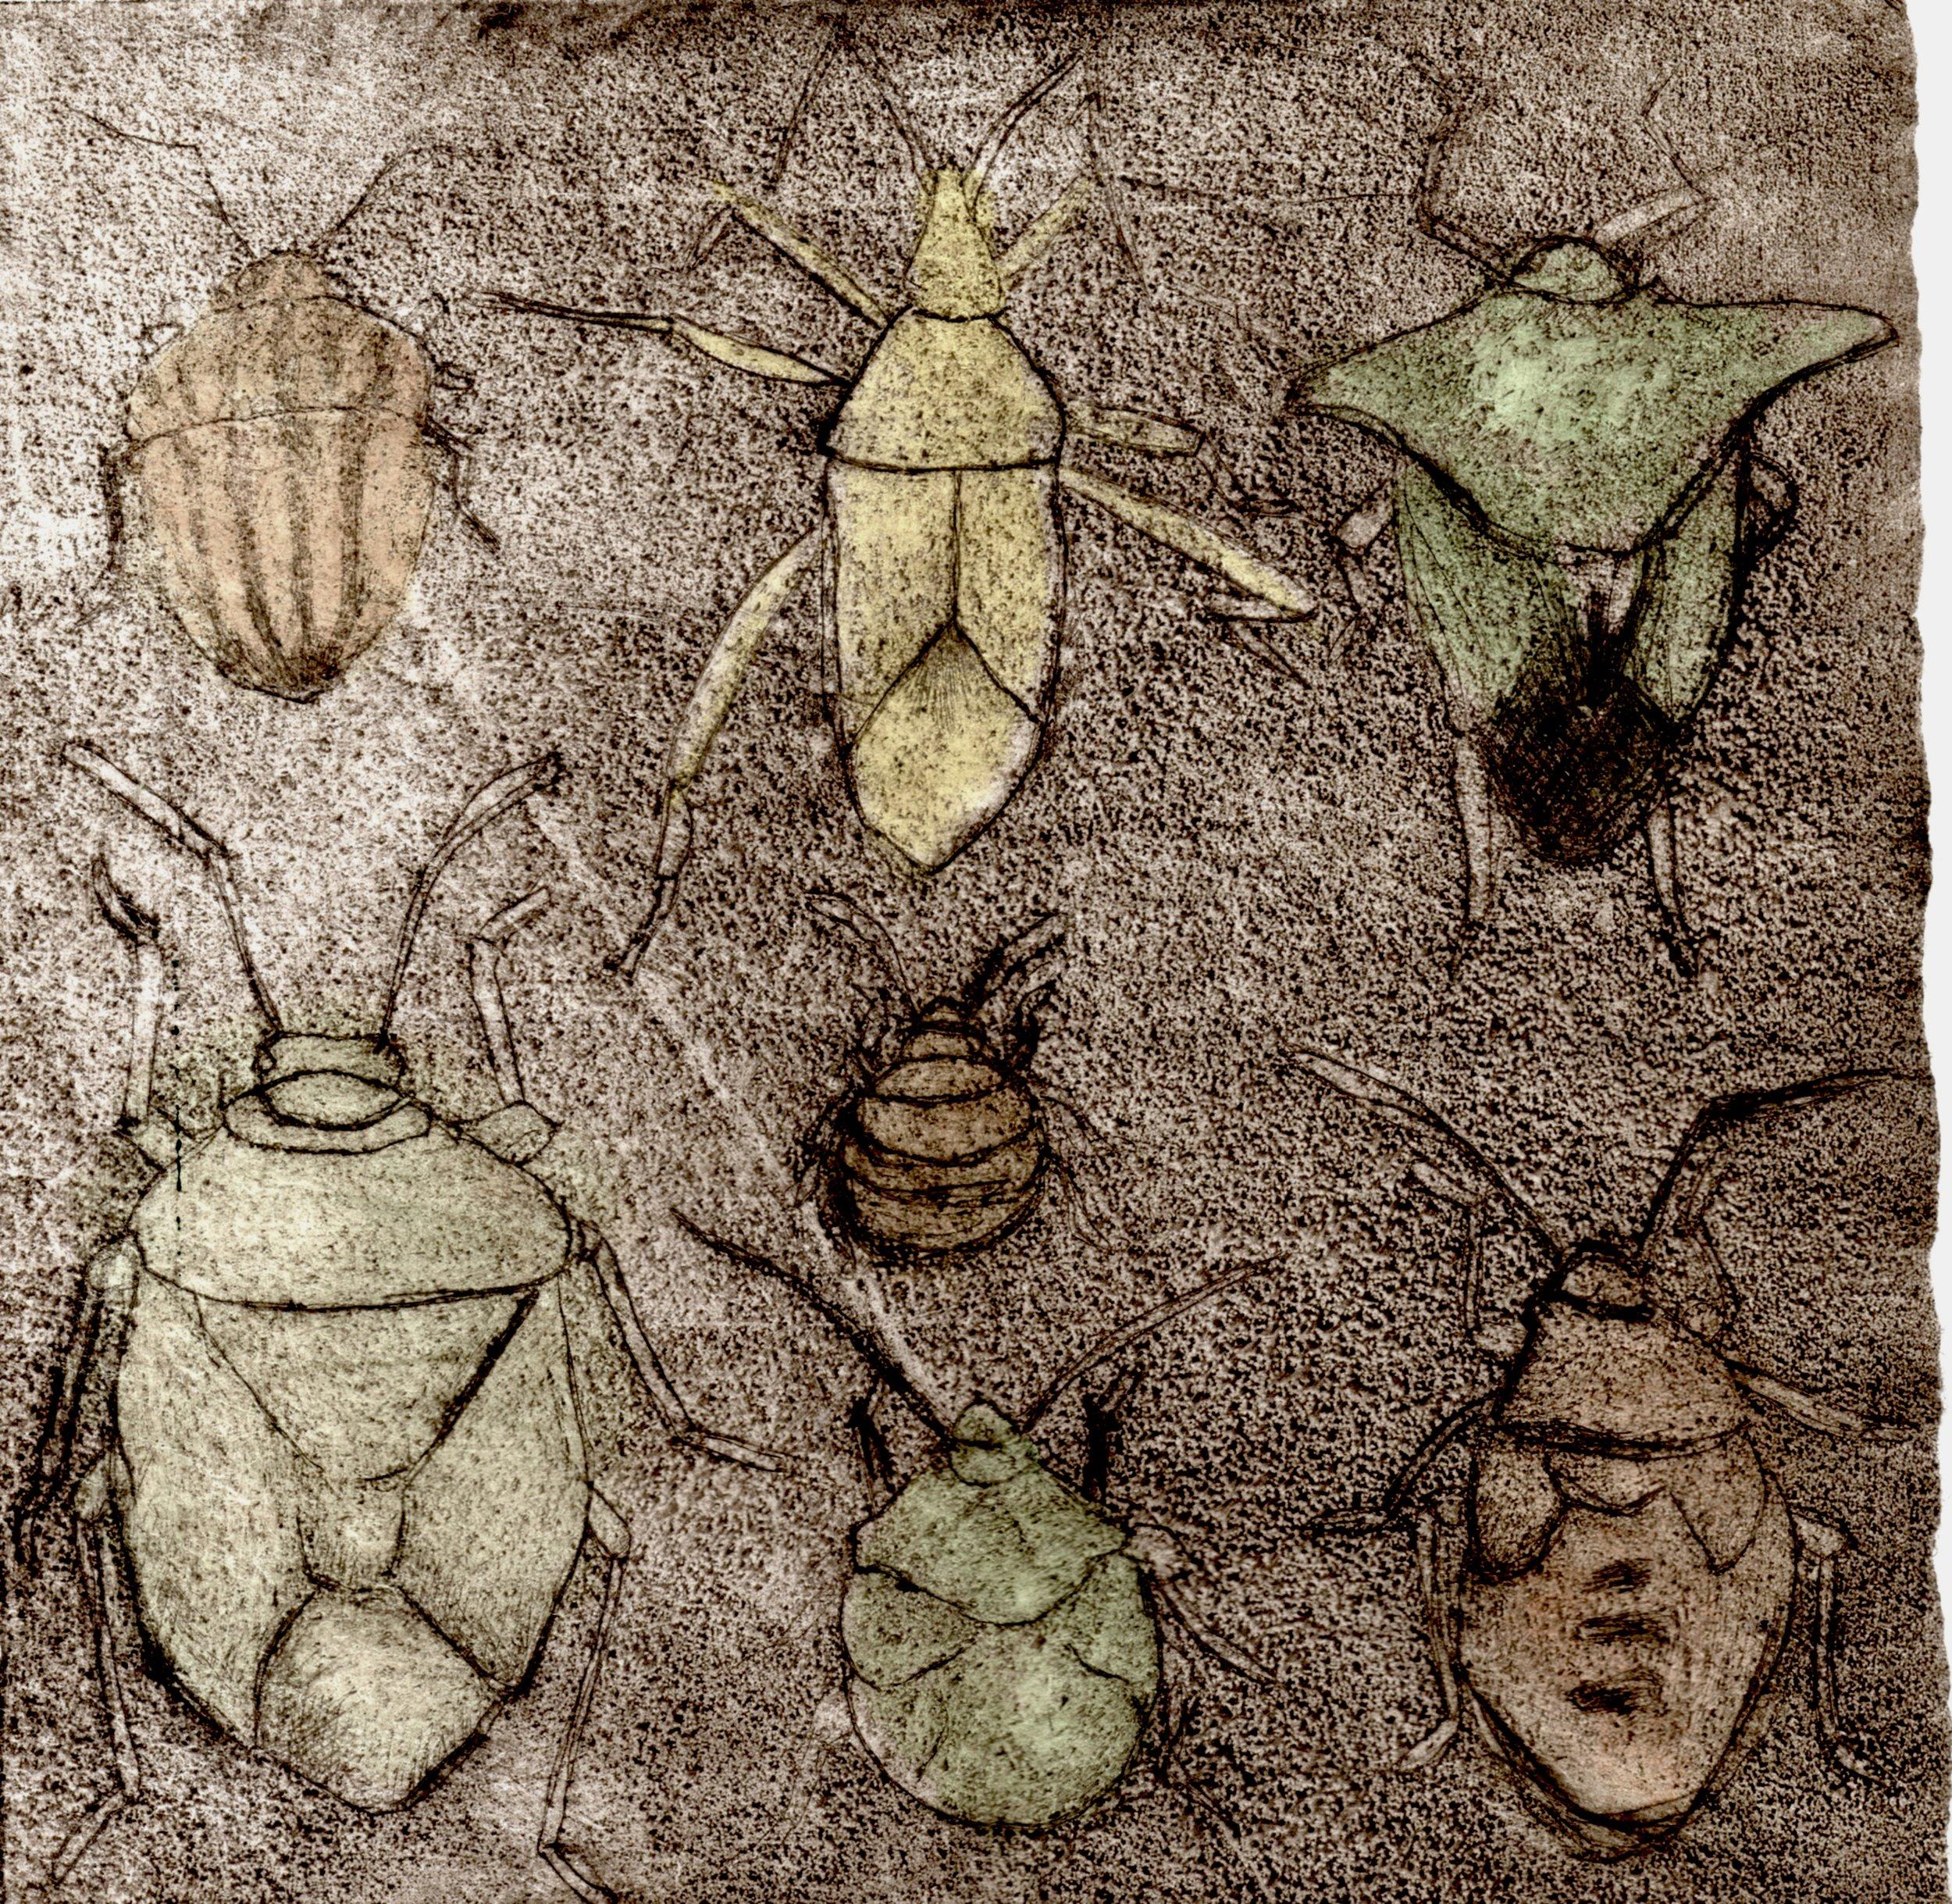 Pest002.jpg